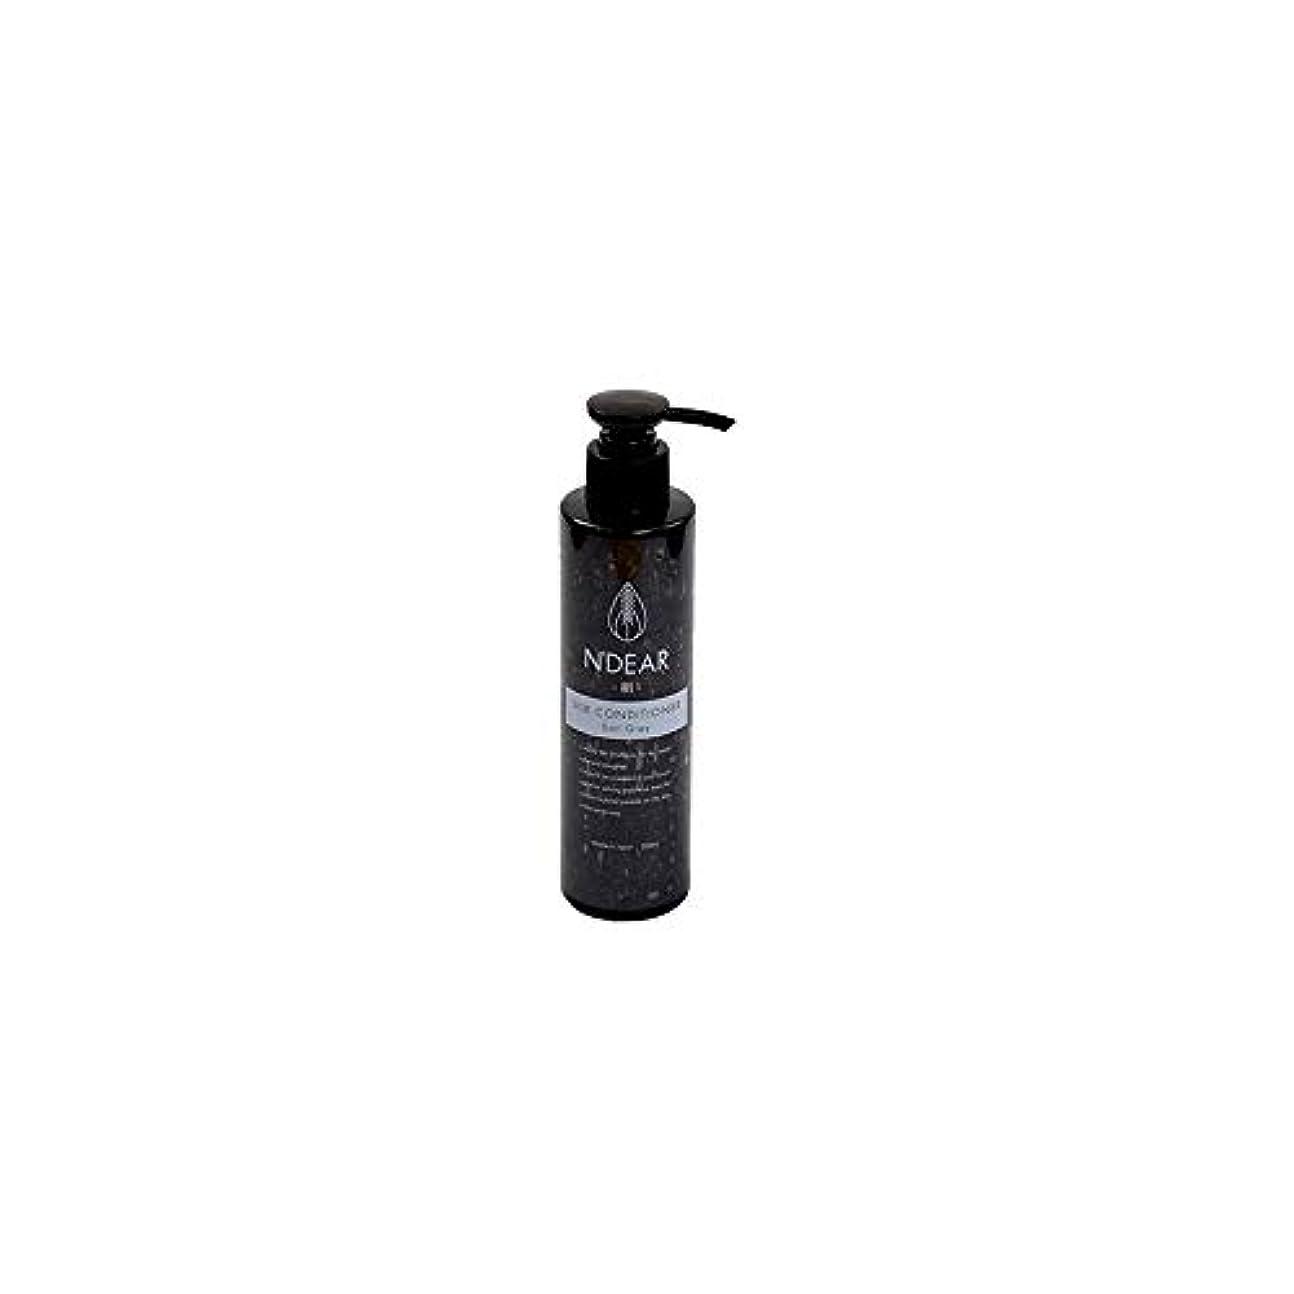 N'DEAR 絹 コンディショナー 無添加 ノンシリコン アミノ酸系洗浄/ヒアルロン酸 セラミド シルク シアバター 配合